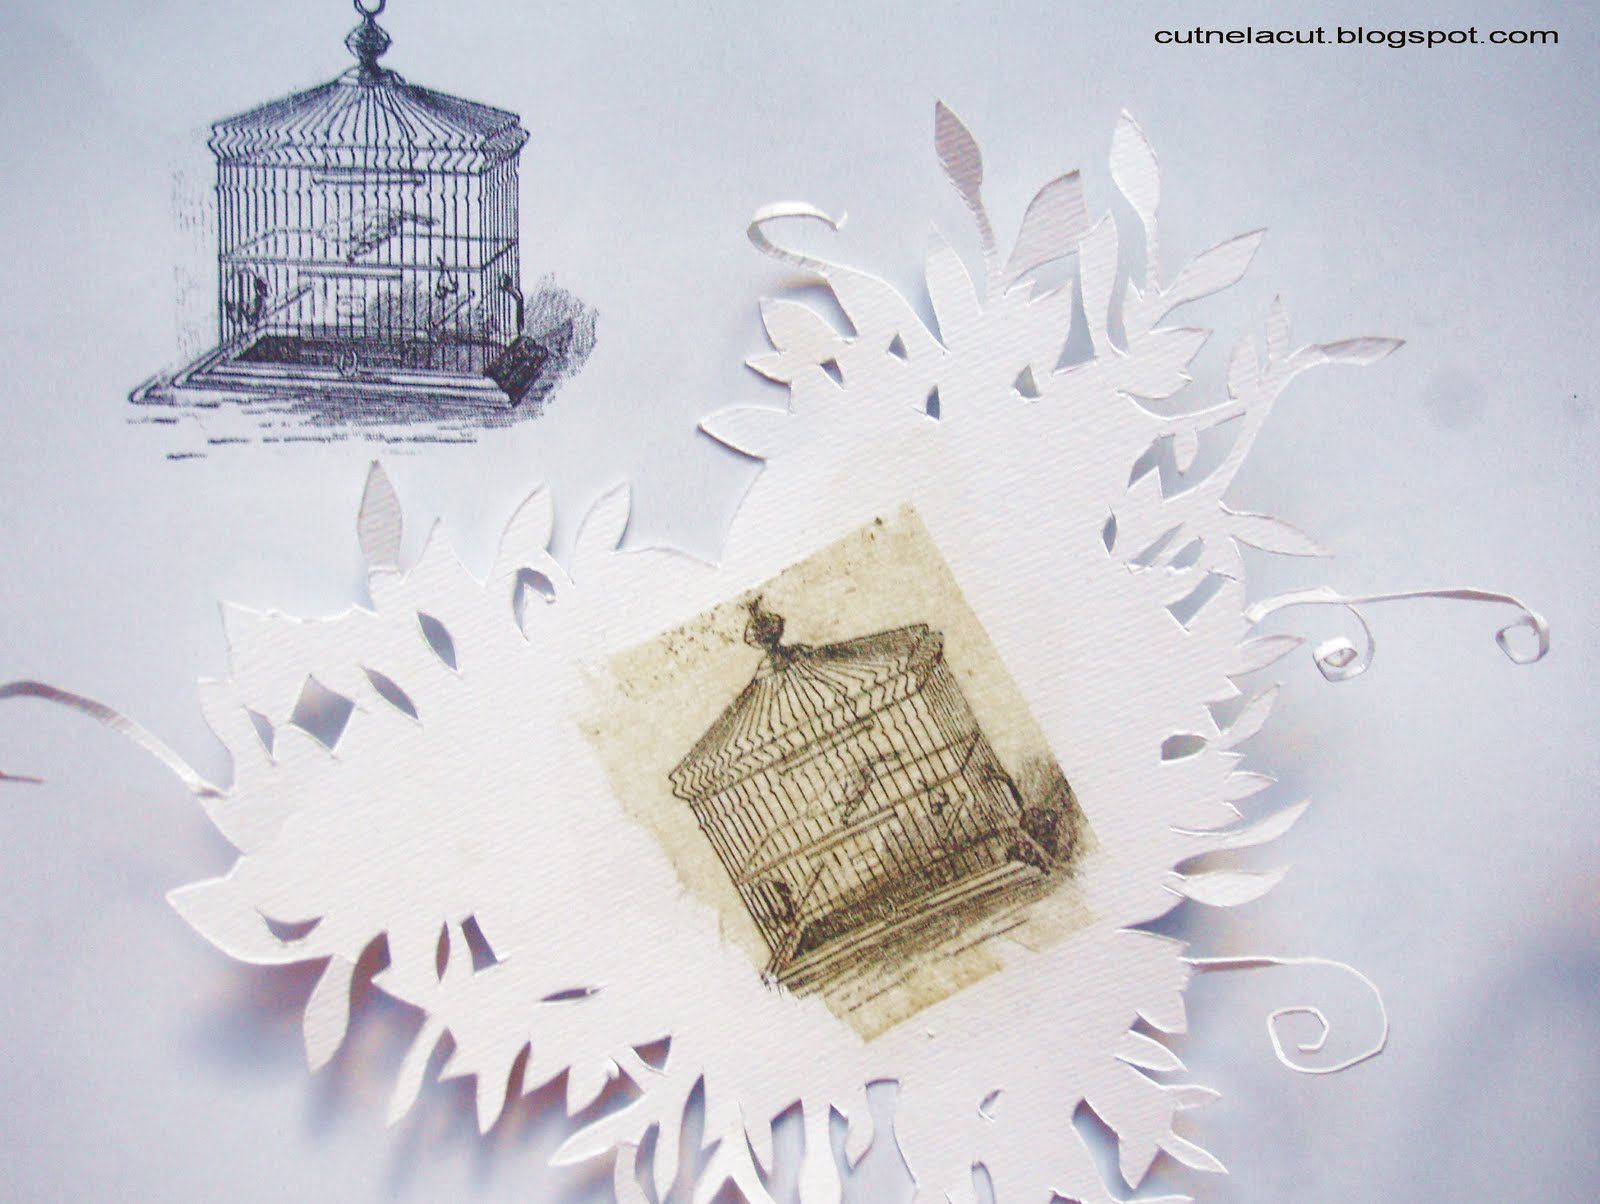 cut, nela, cut: Tea bag printing